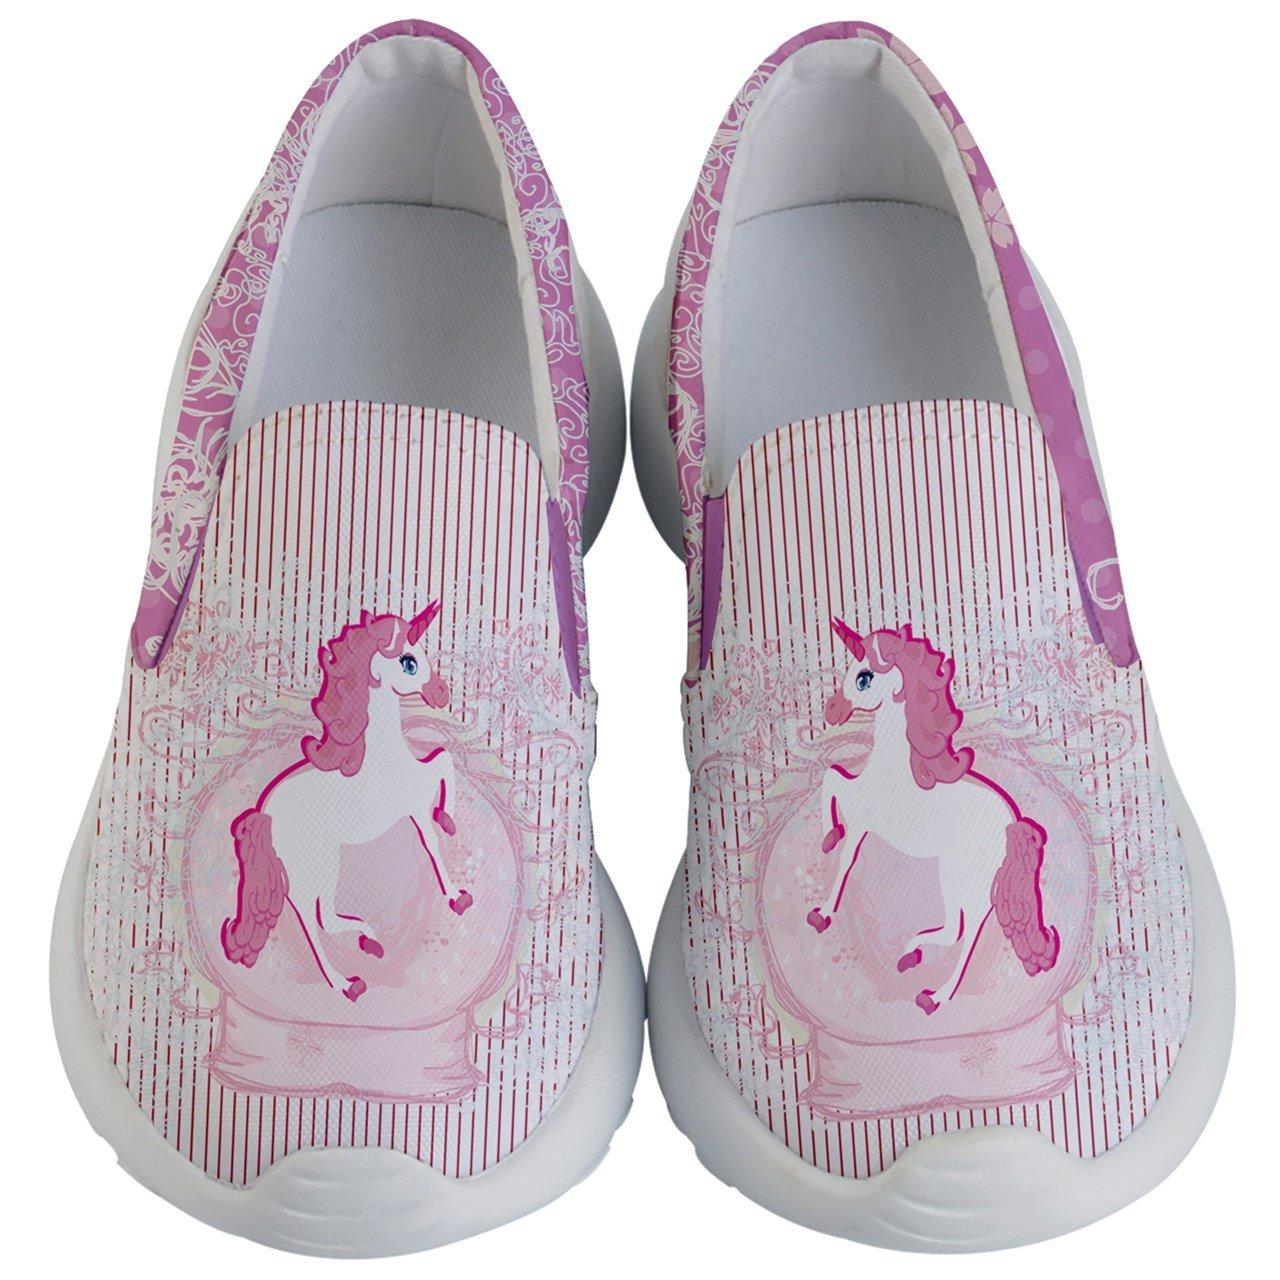 PattyCandy Girls Slip Ons Joyful Animals & Lovely Unicorn Pattern Kids Lightweight Casual Shoes, Size:US 8C-US 7Y PattyCandy-137945492